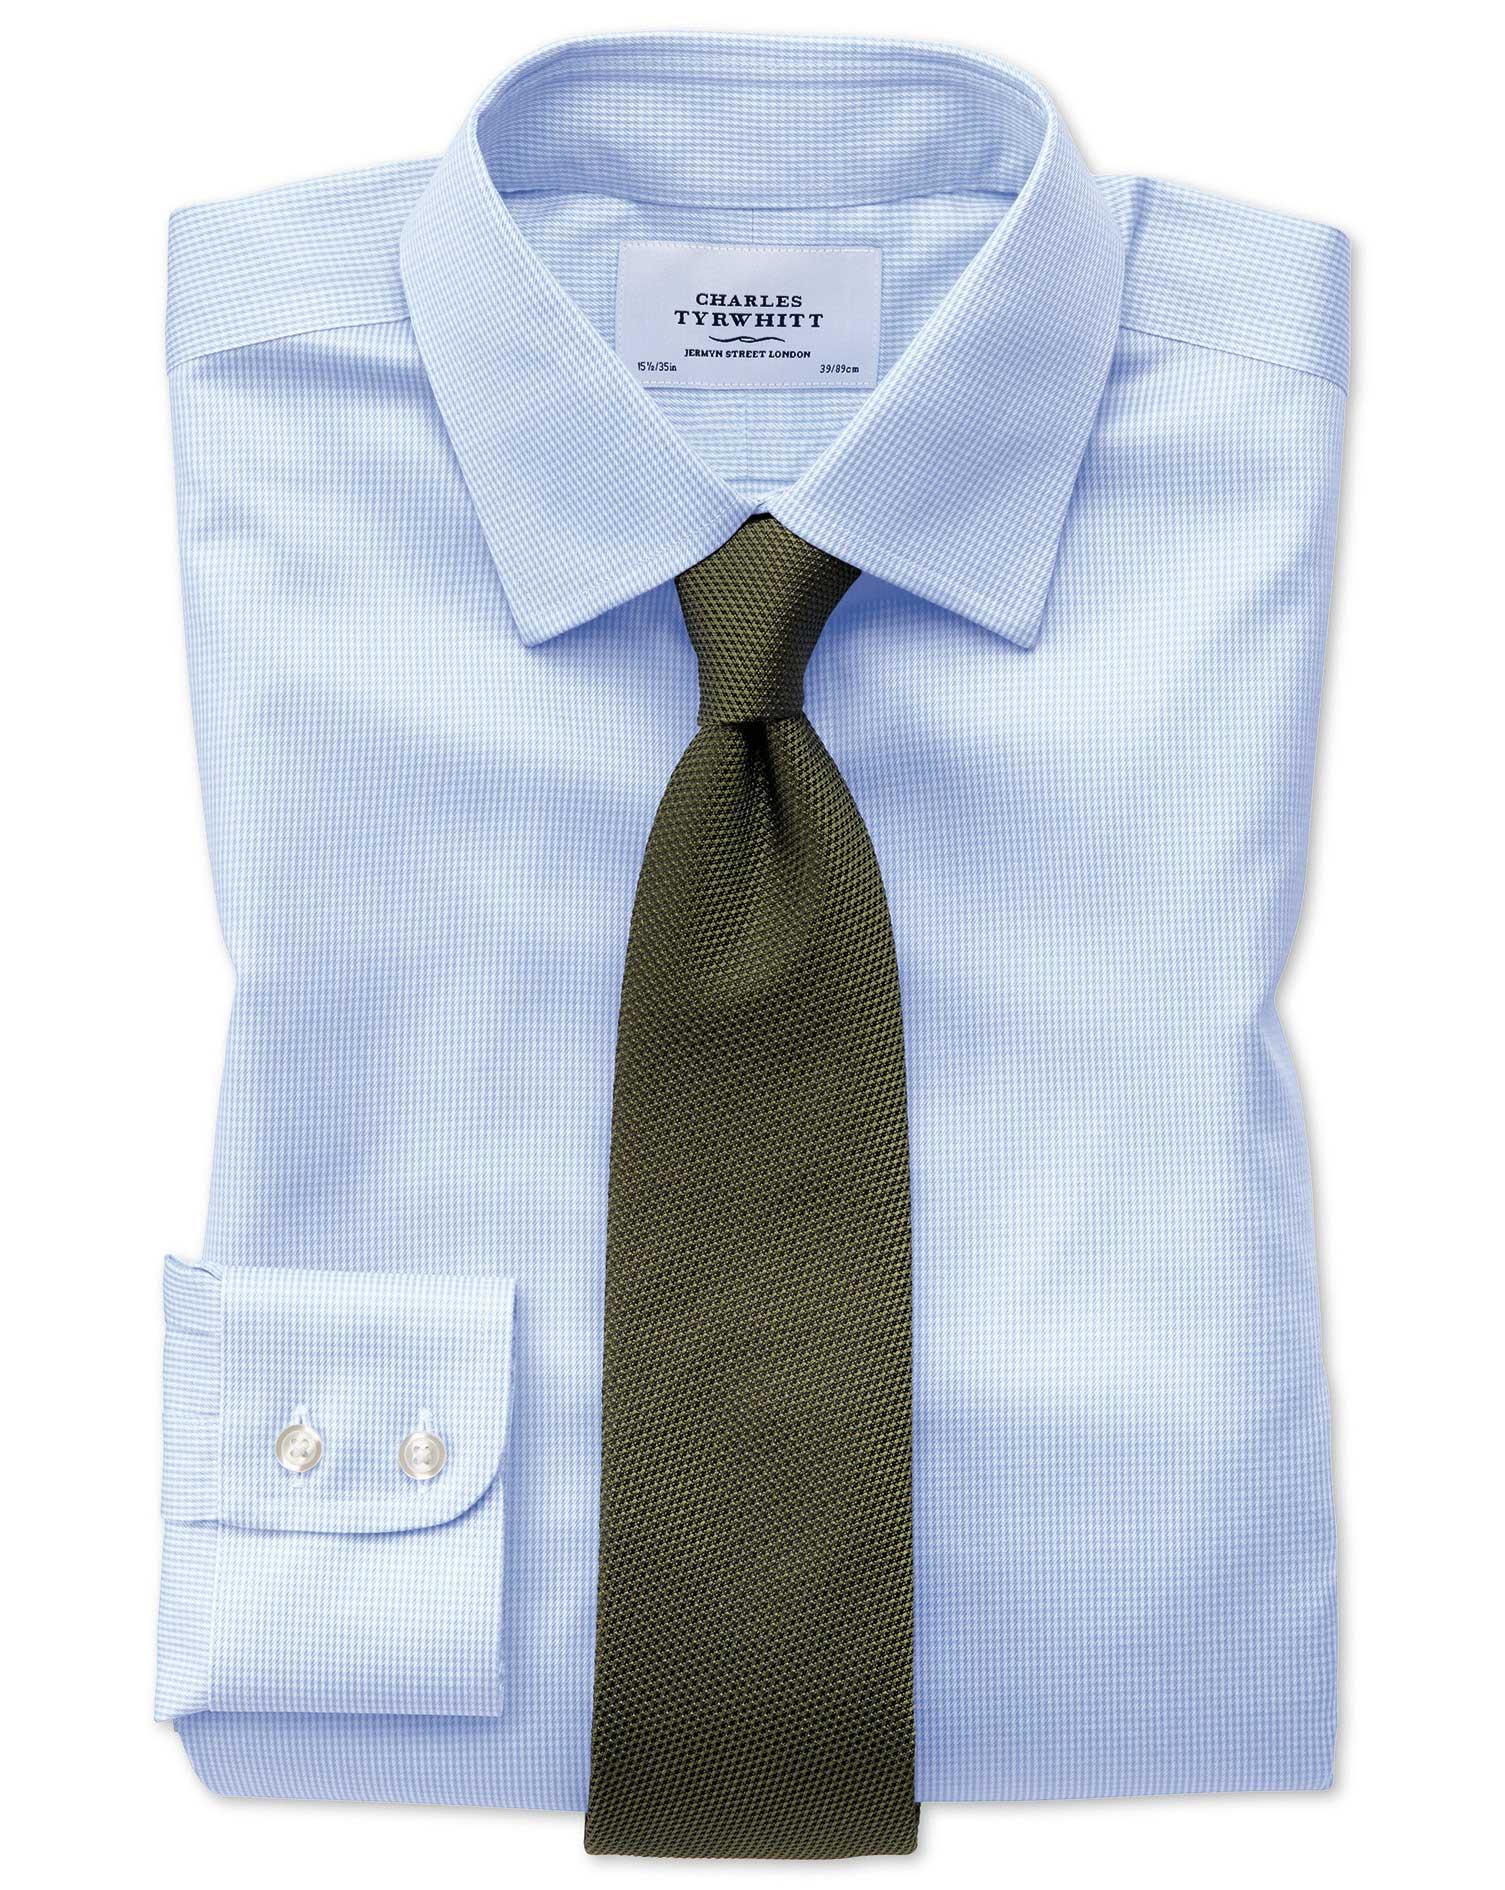 Extra Slim Fit Non Iron Puppytooth Sky Blue Shirt